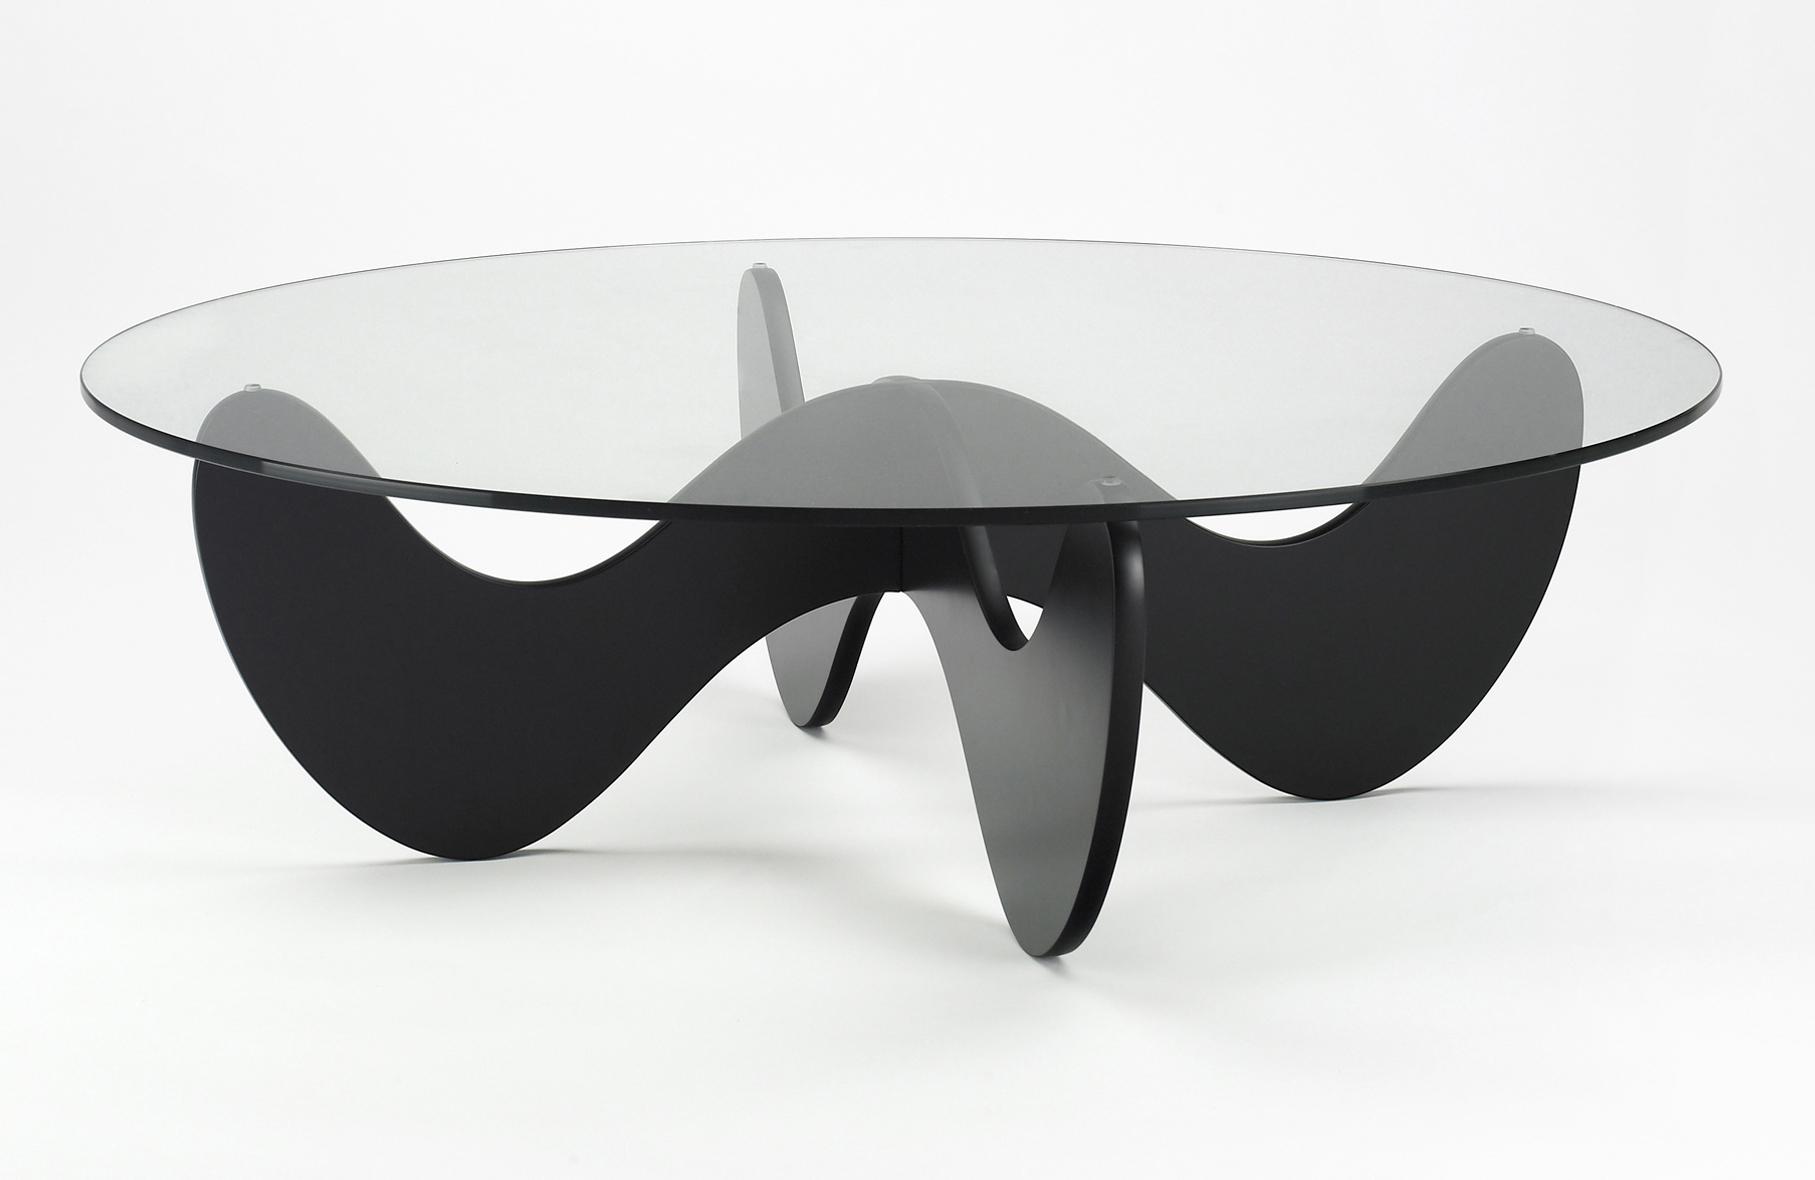 2. Waikiki table black 1.jpg